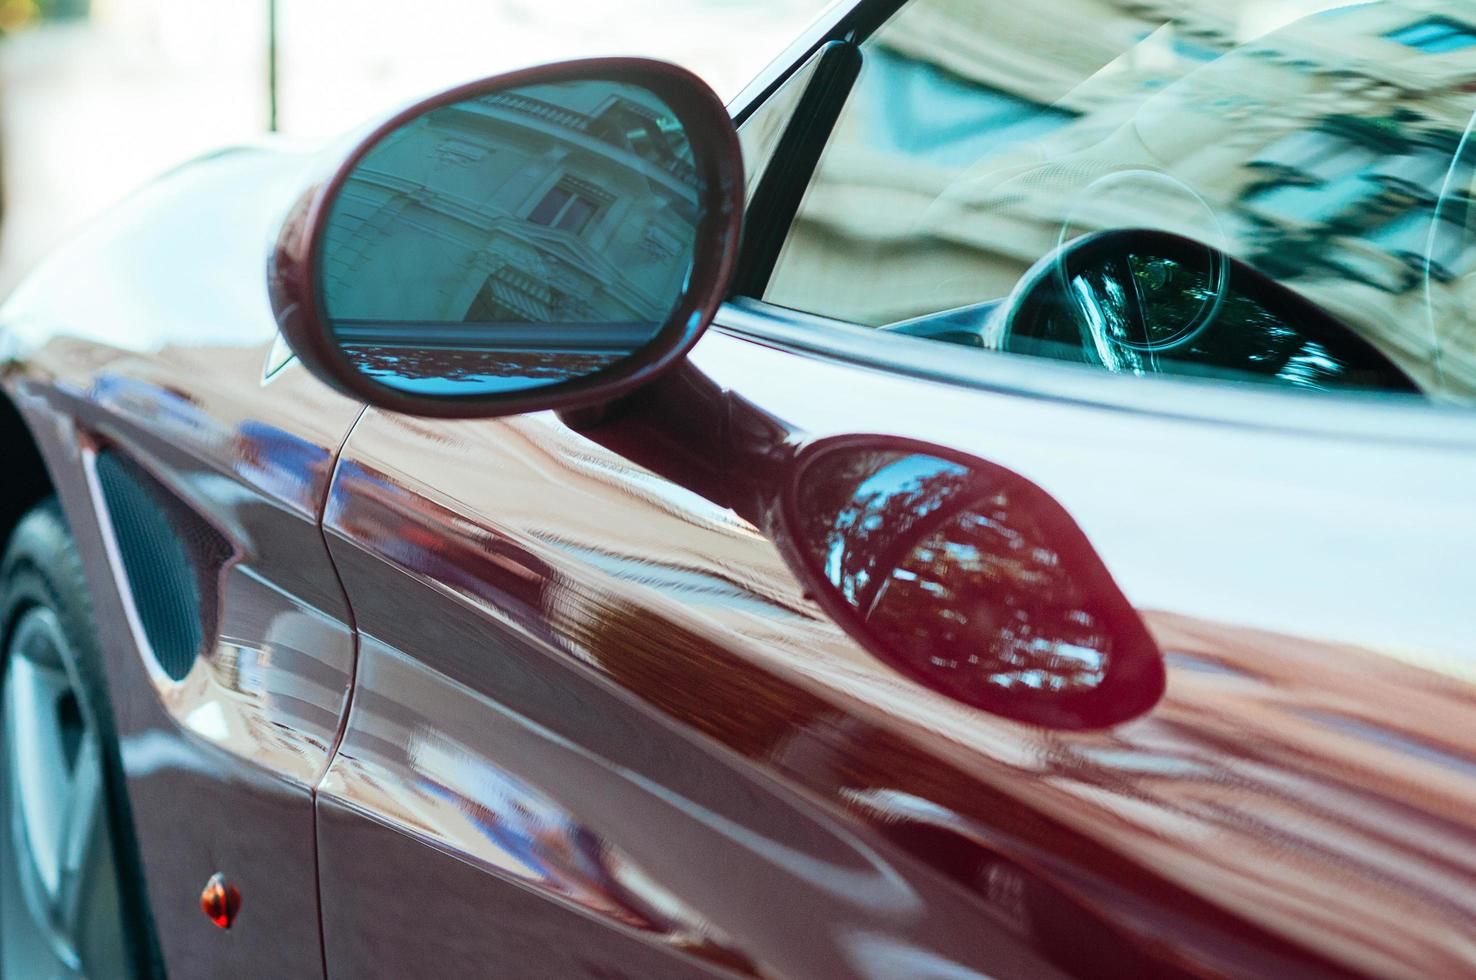 Detalle del coche deportivo rojo de lujo foto